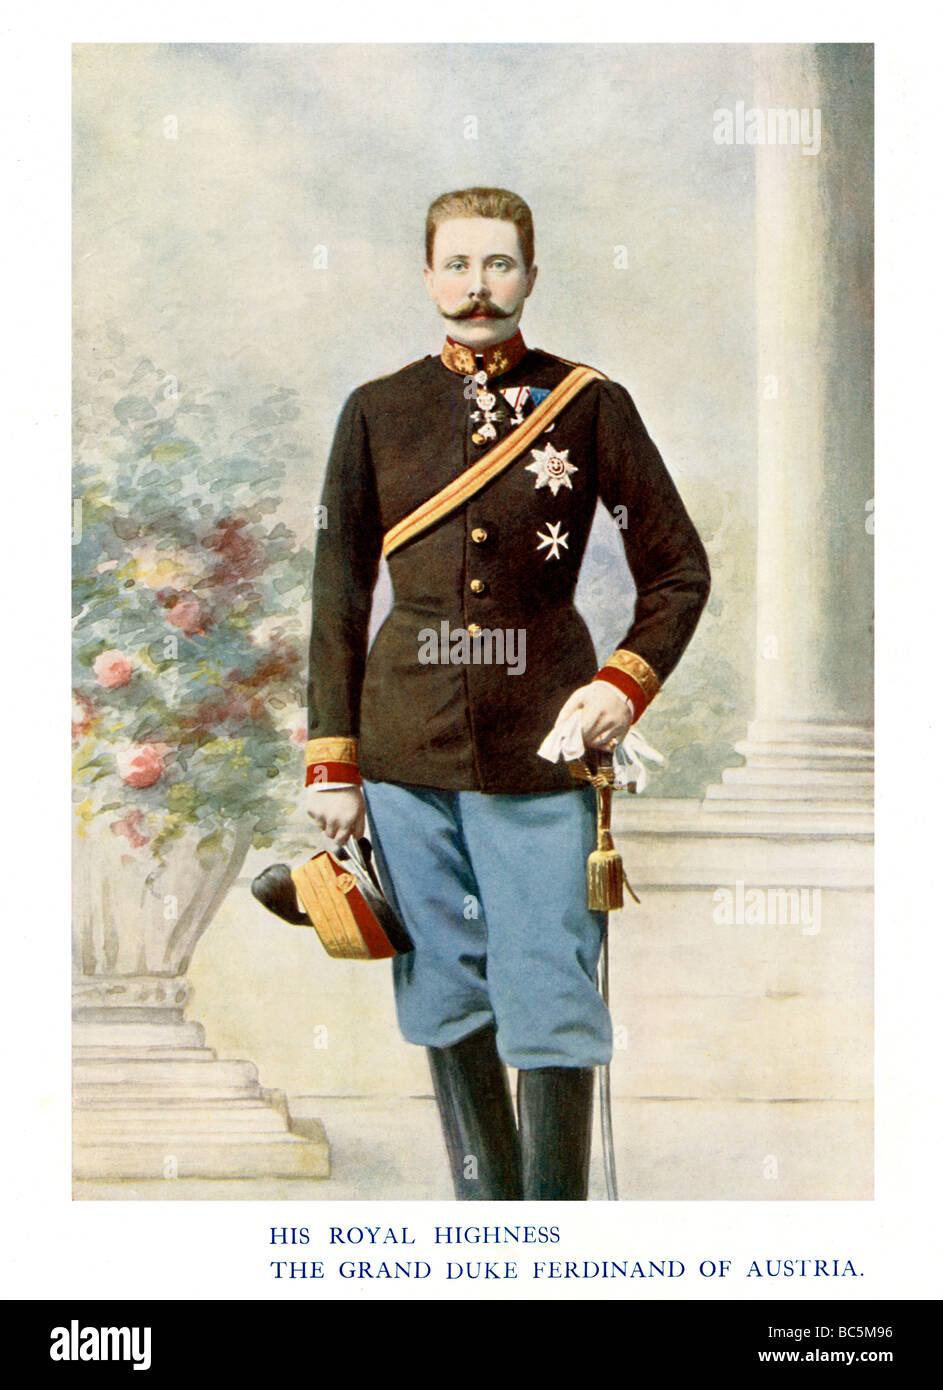 Archduke Franz Ferdinand 1901 colour portrait photograph of the nephew of Emperor Franz Joseph assassinated at Sarajevo - Stock Image